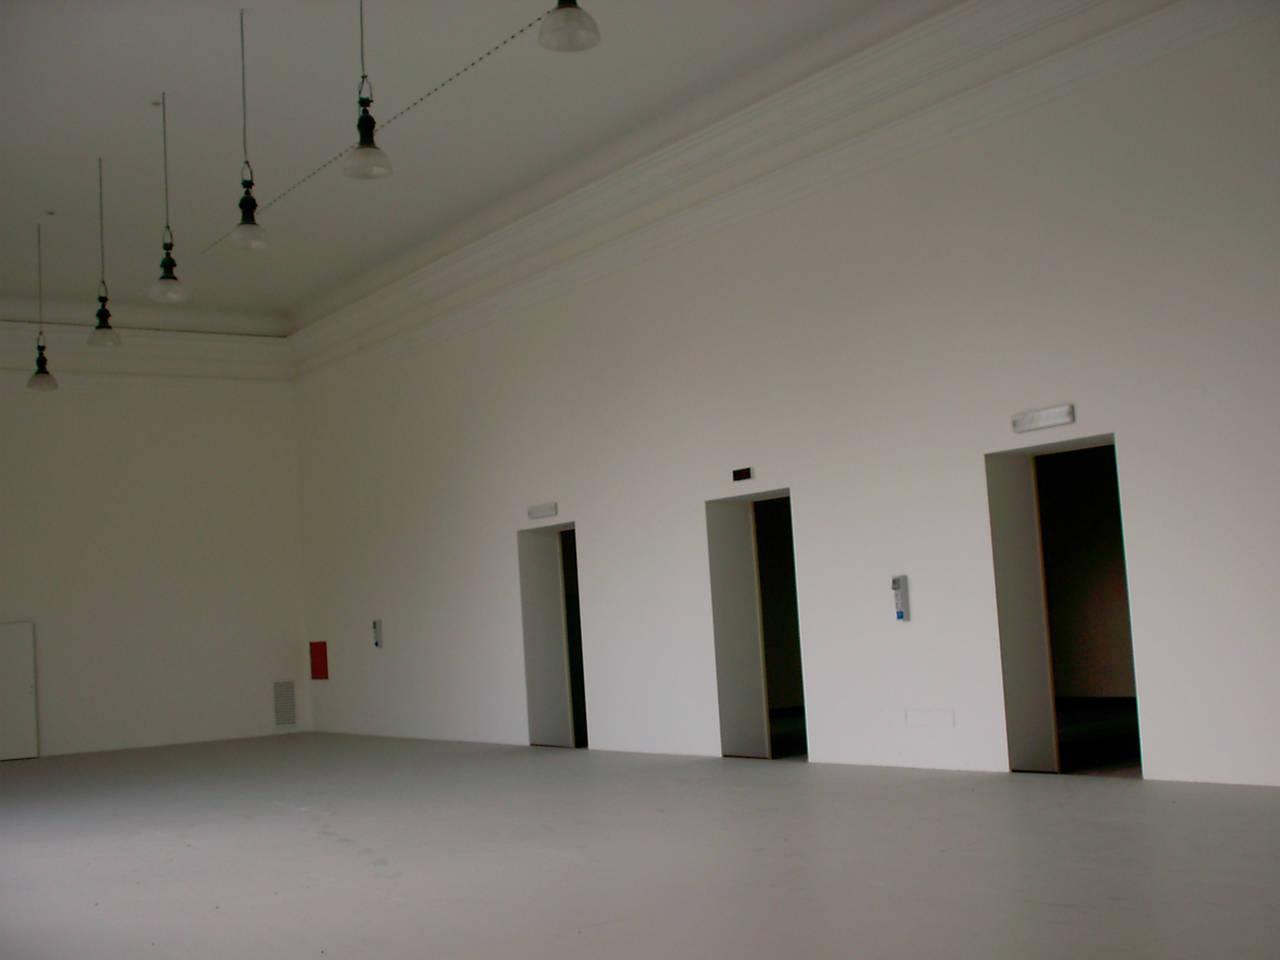 sala verdi prima del restauro